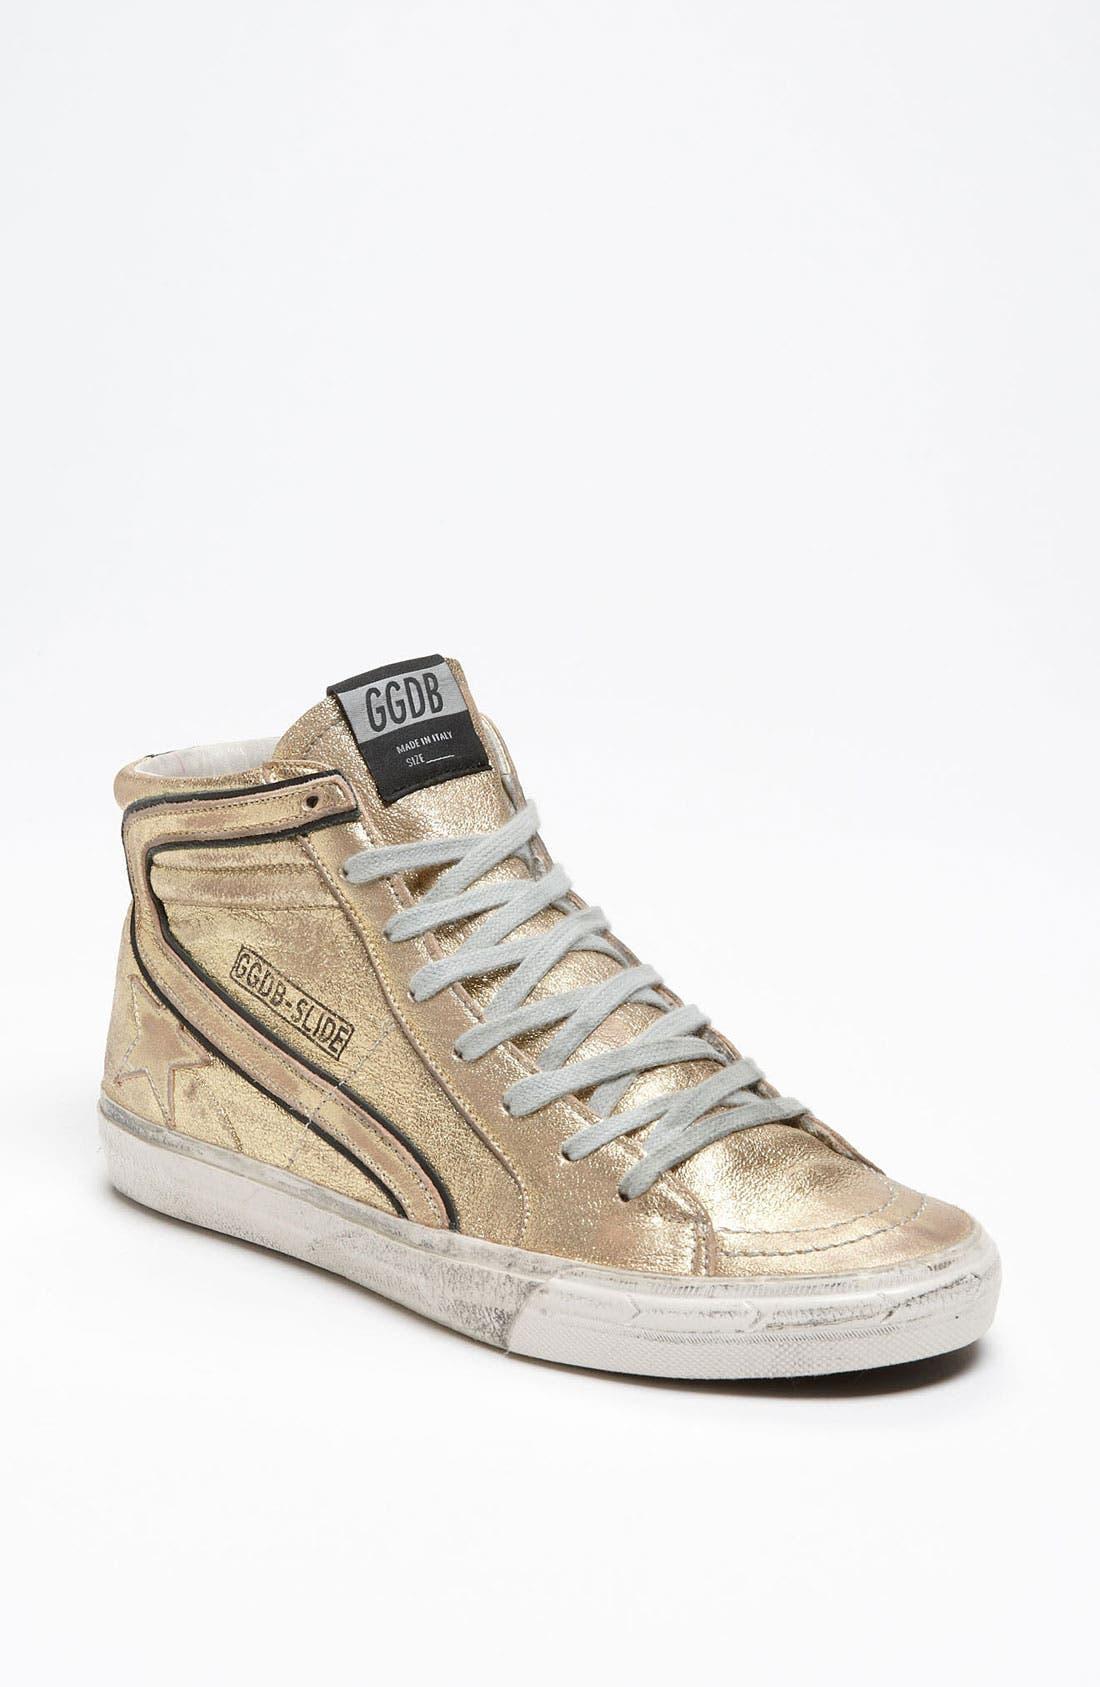 Alternate Image 1 Selected - Golden Goose 'Mid Top Slide' Sneaker